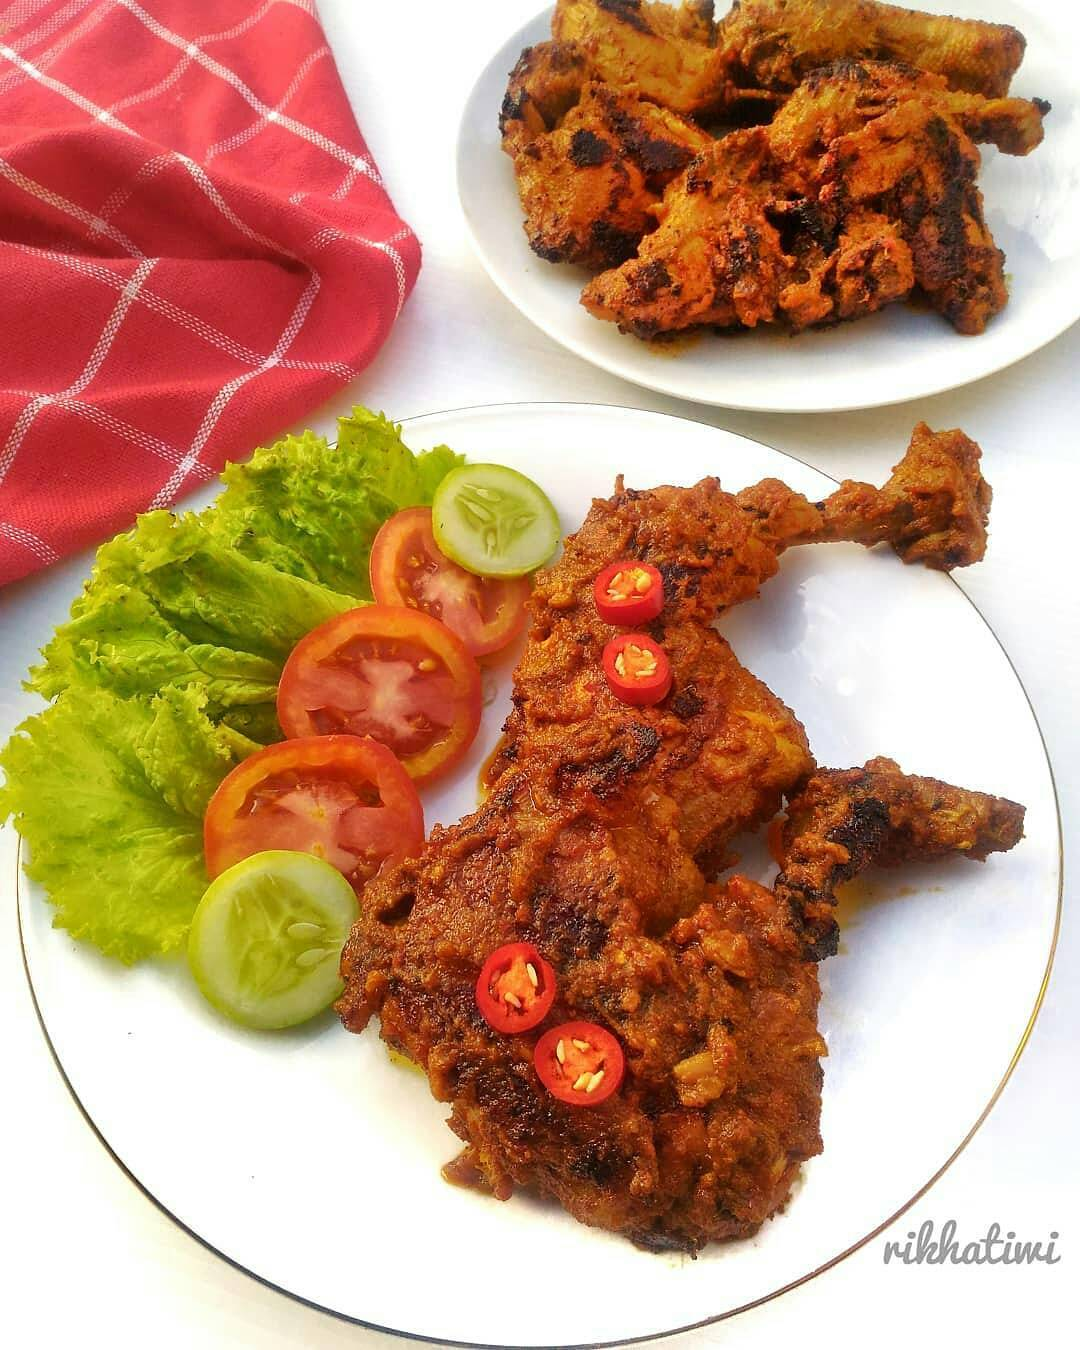 Resep Ayam Bumbu Rujak Antimainstream